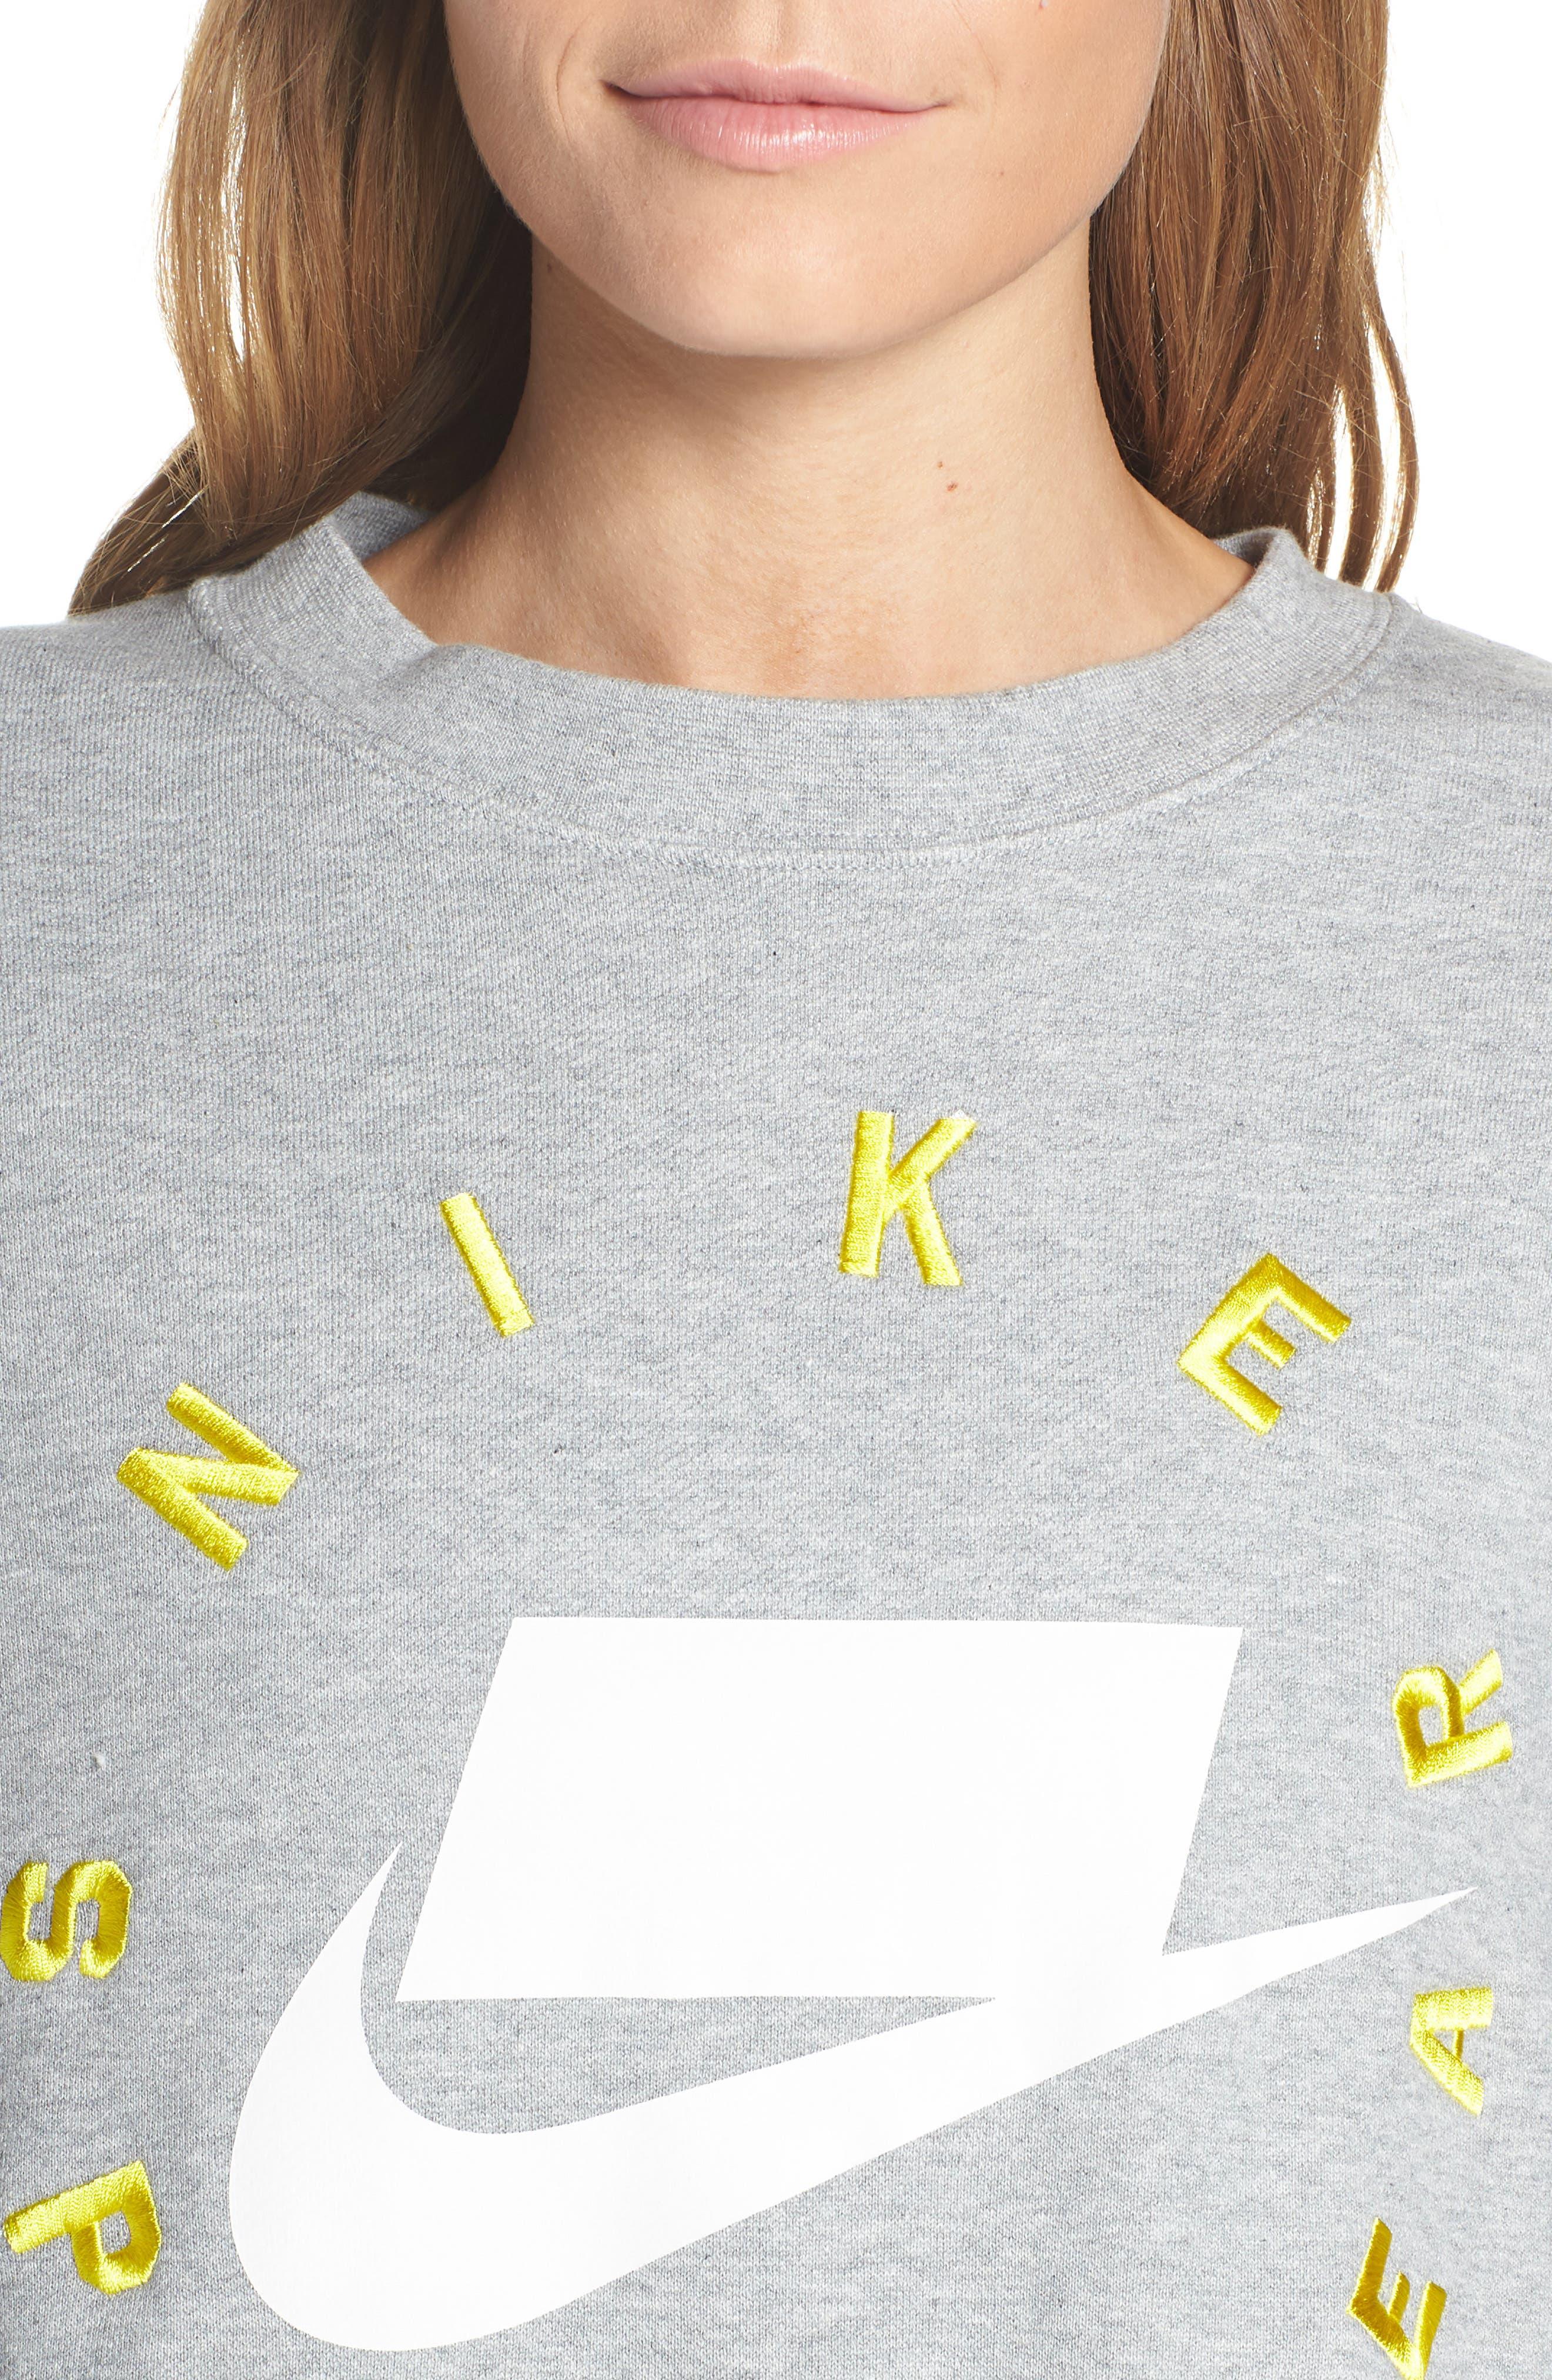 NIKE, Sportswear Logo Oversize Sweatshirt, Alternate thumbnail 5, color, DARK GREY HEATHER